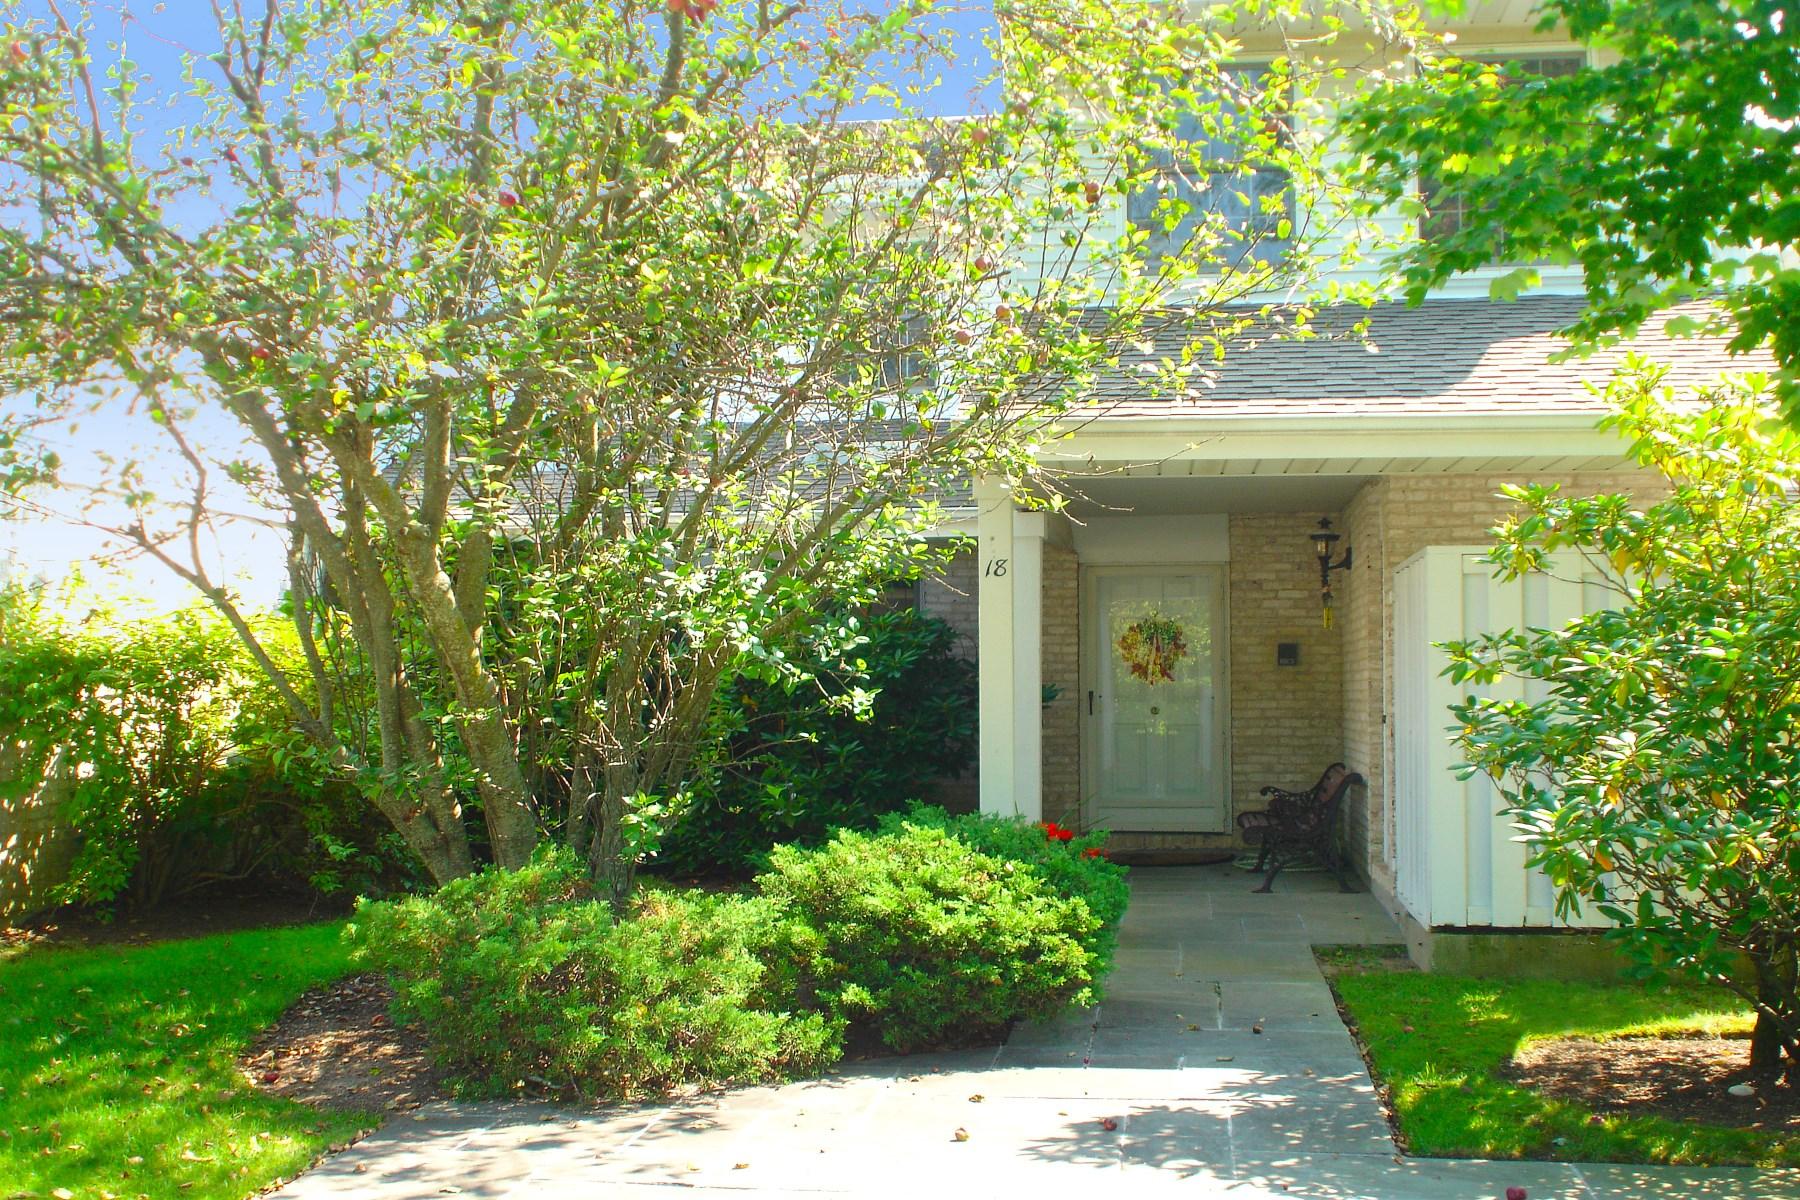 Condominium for Sale at South of 27 Close to Ocean Beaches 520 Hampton Road Unit 18 Southampton, New York, 11968 United States